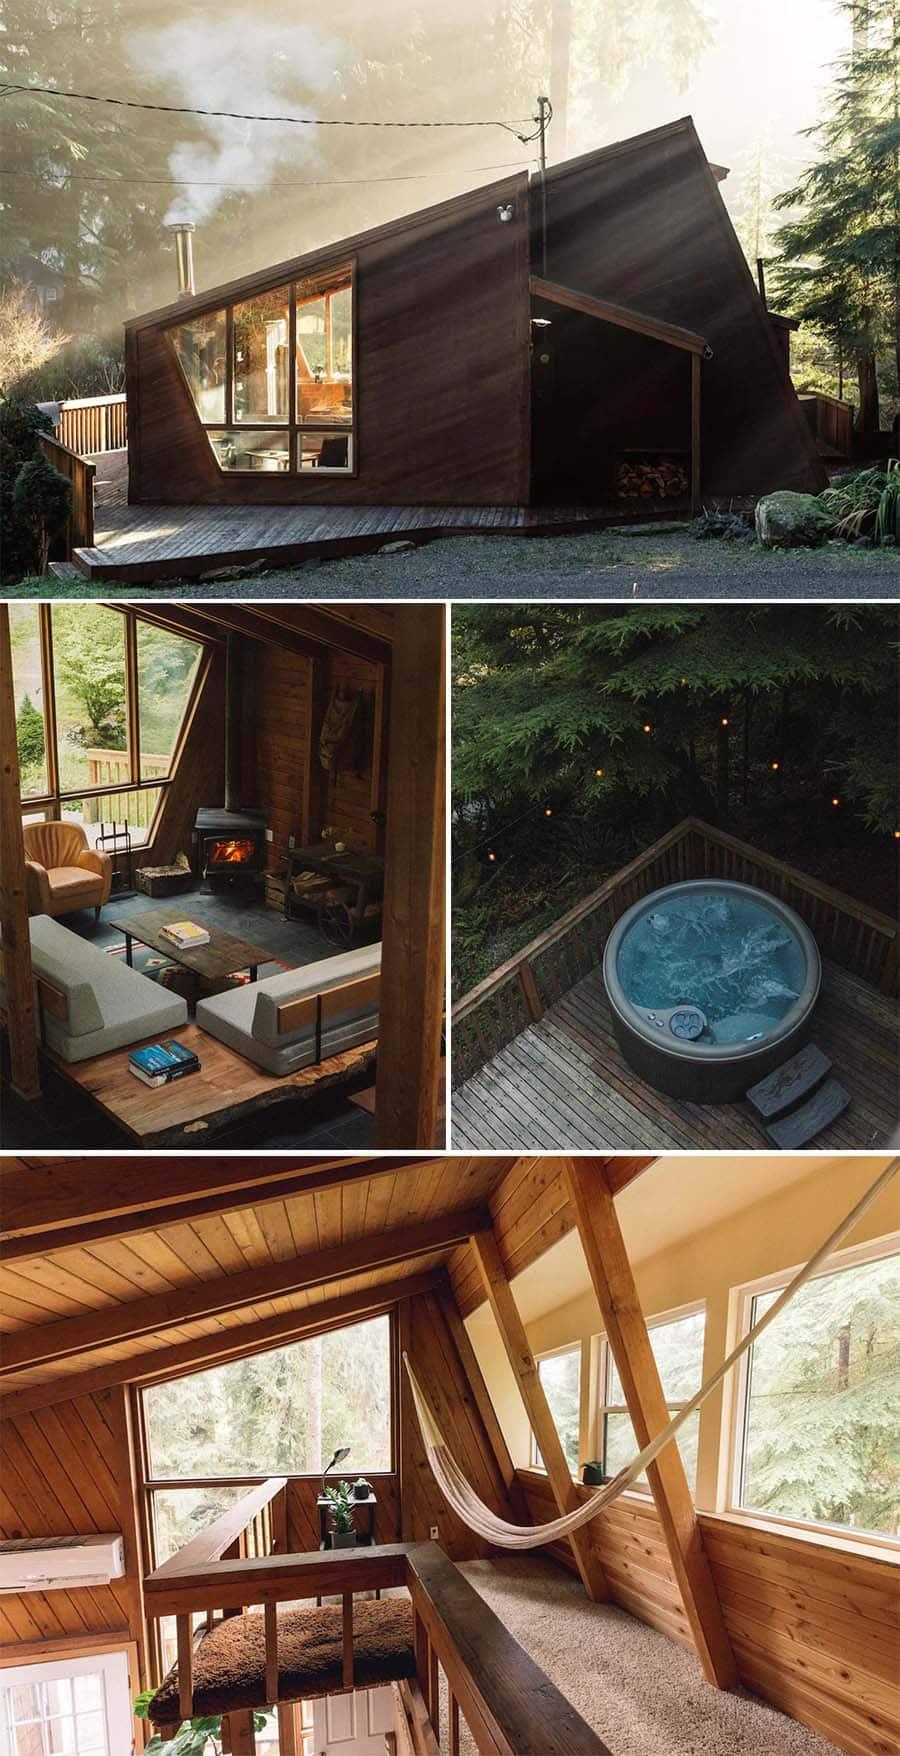 Canyon Creek cabins in Granite Falls, Washington